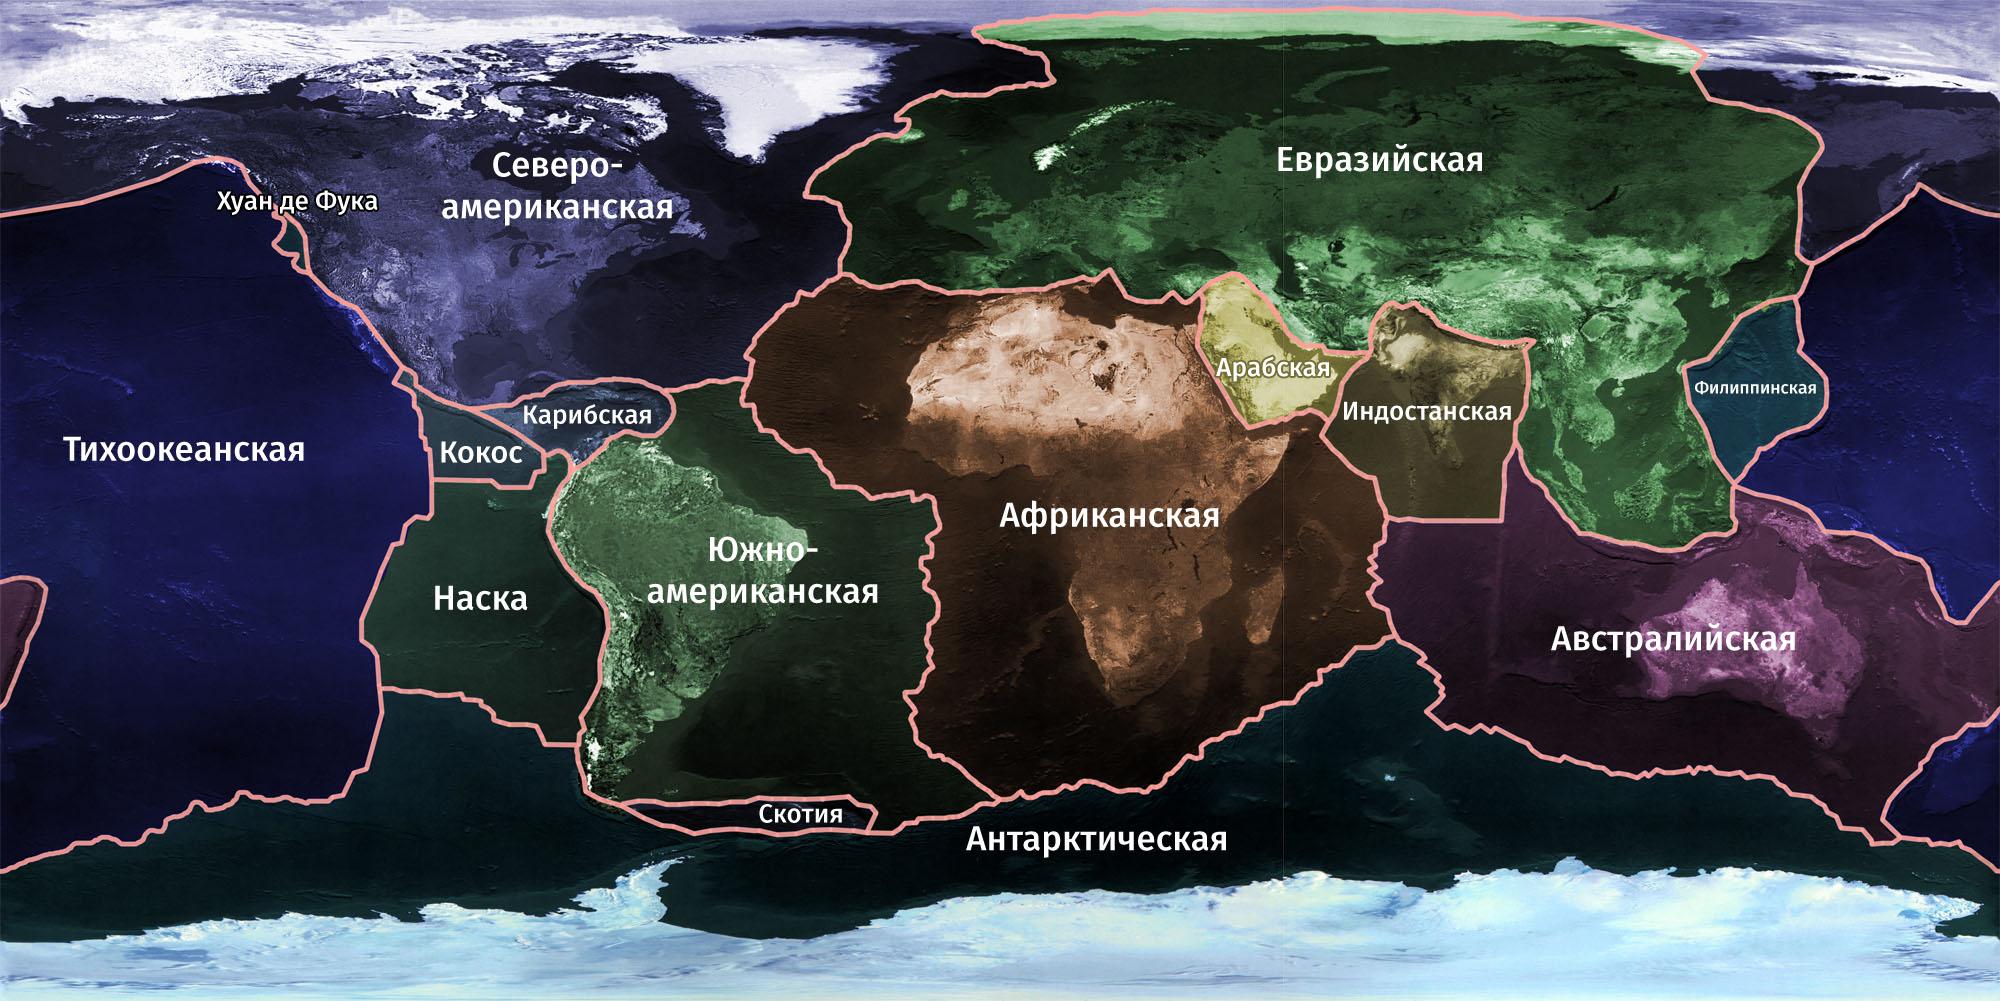 ru66-kak-sviazano-dvizhenie-plit-zemli-s-zhizniu-na-planete_02